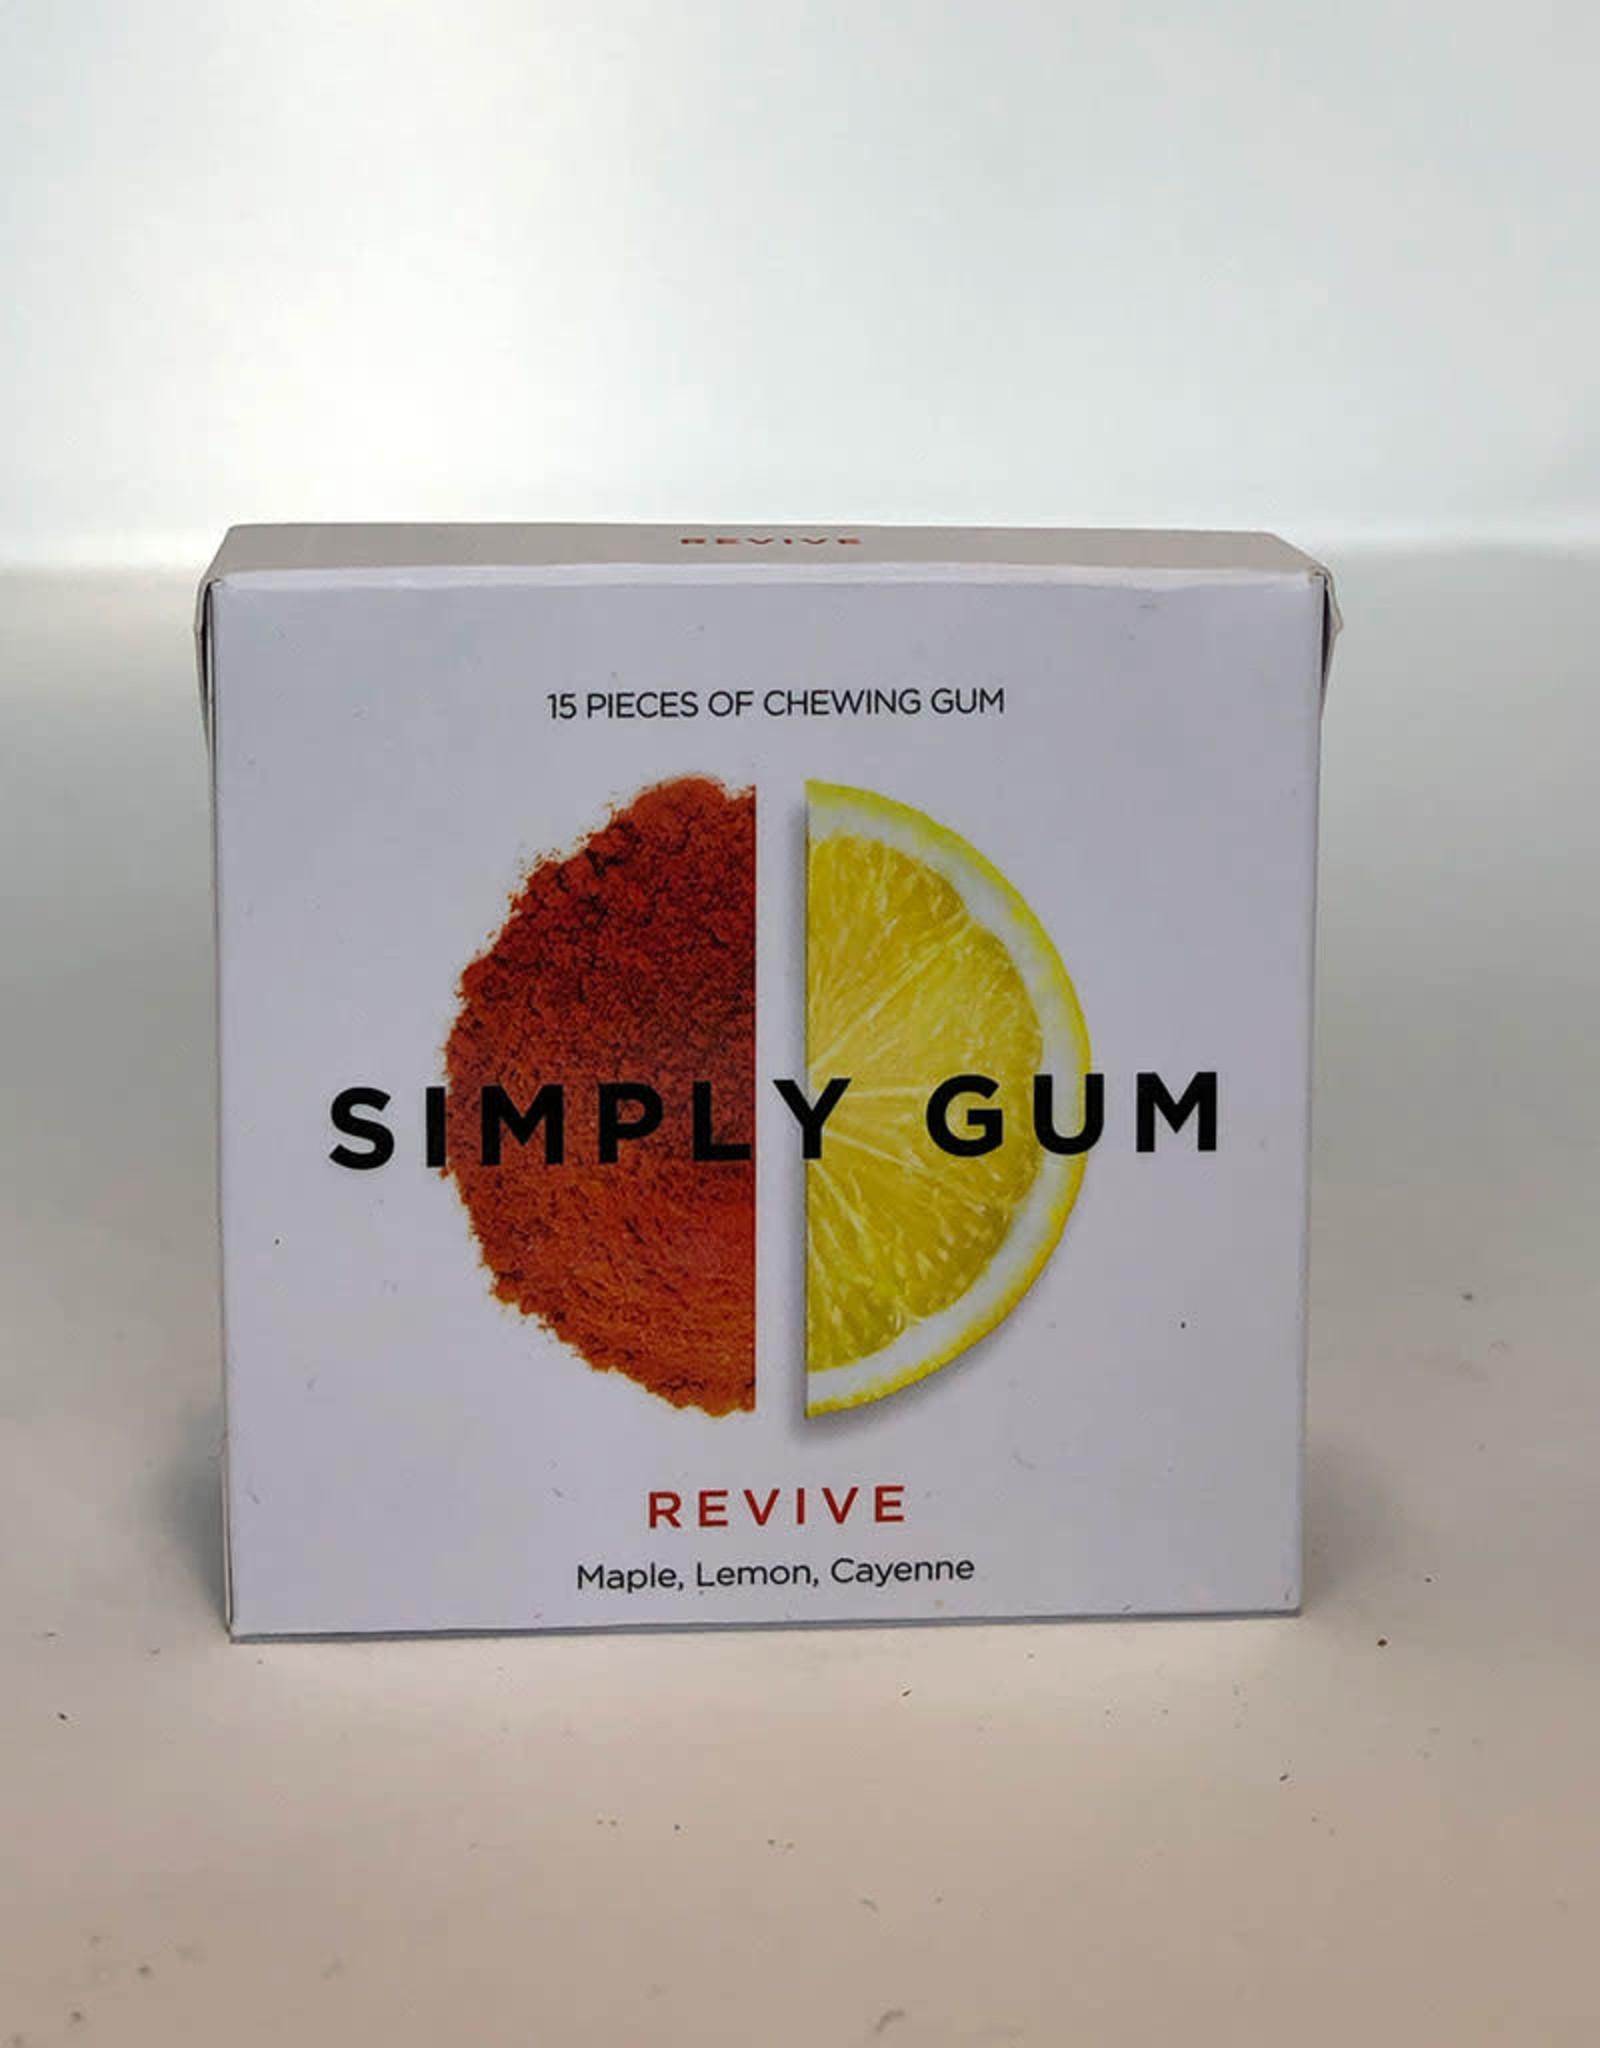 Simply Gum Simply Gum - Revive, Maple, Lemon, Cayenne